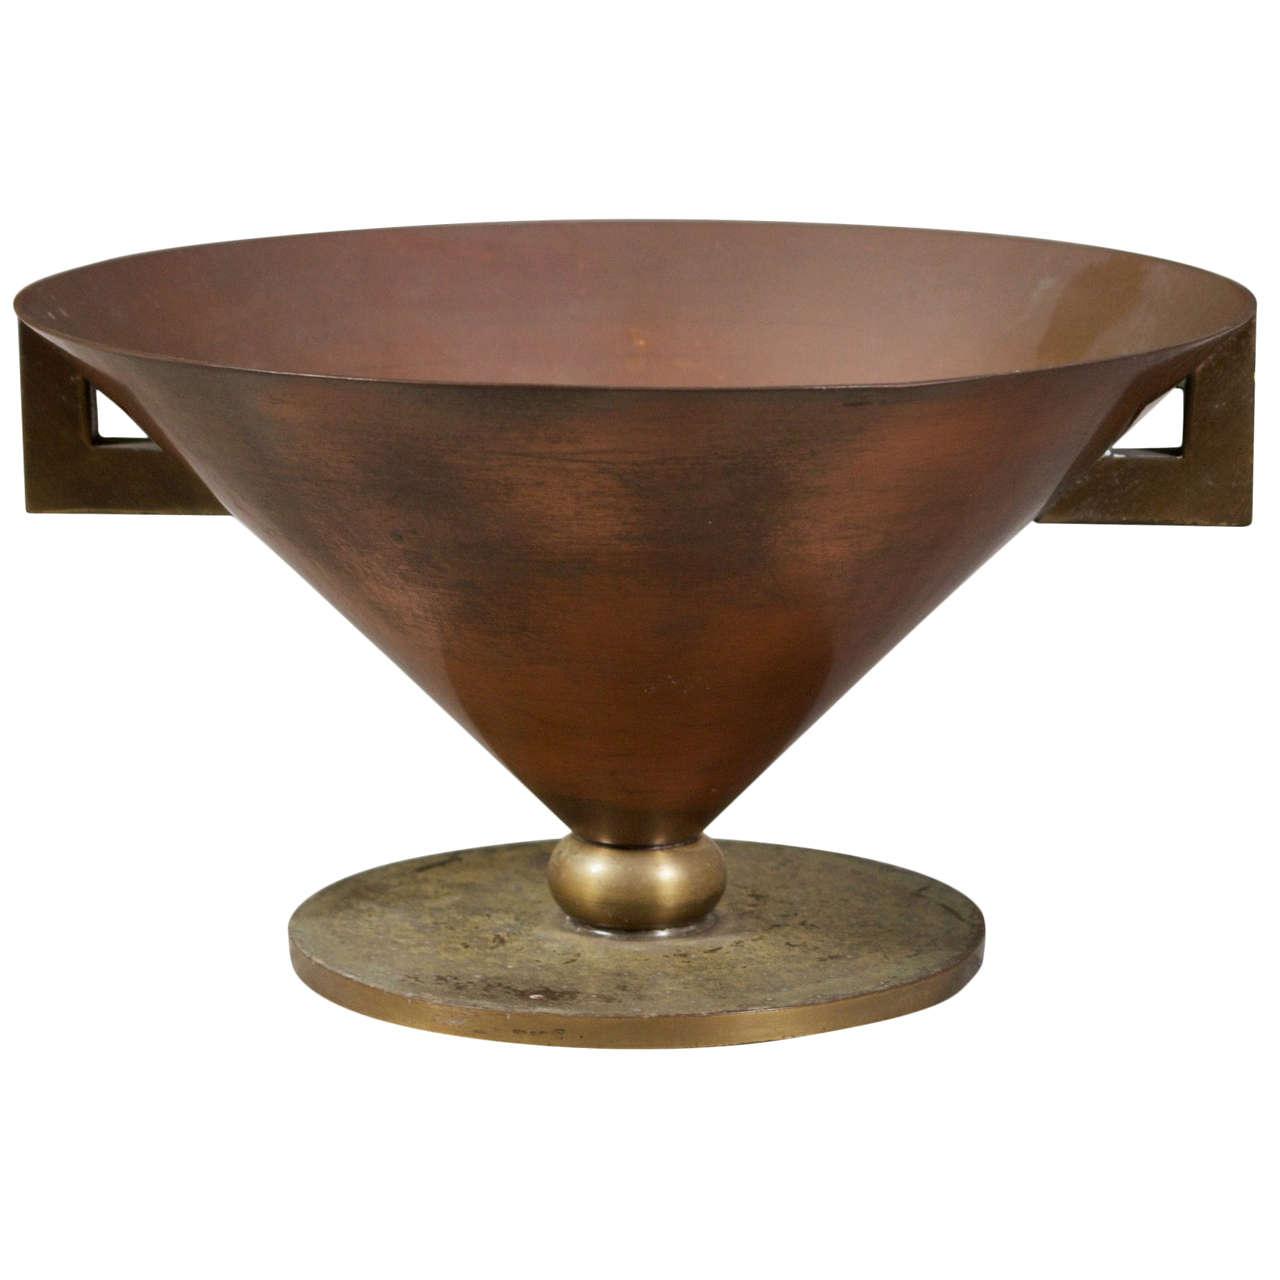 Roycroft Conical Vase at 1stdibs